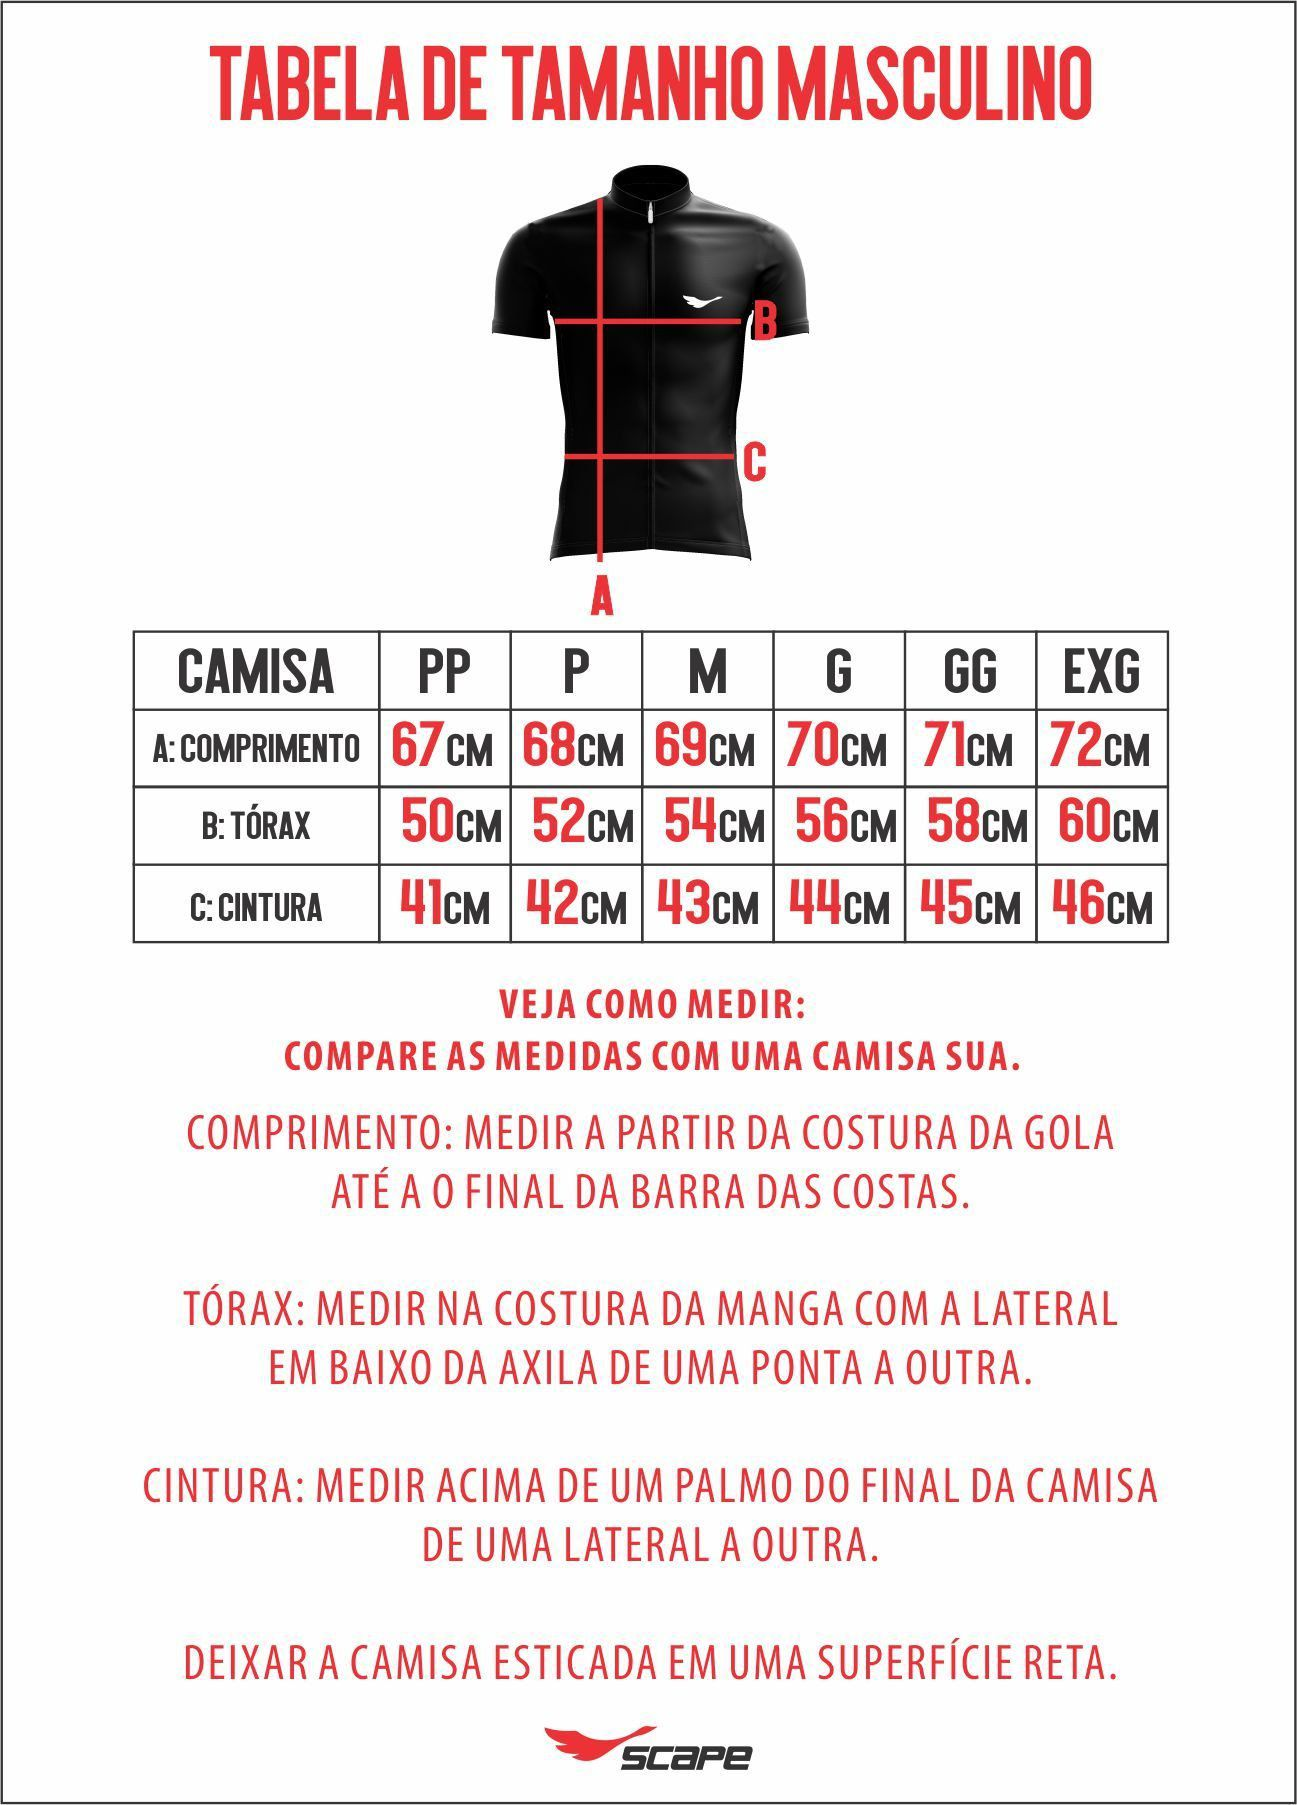 CAMISA RED BULL CICLISMO CAMUFLADA AZUL E CINZA